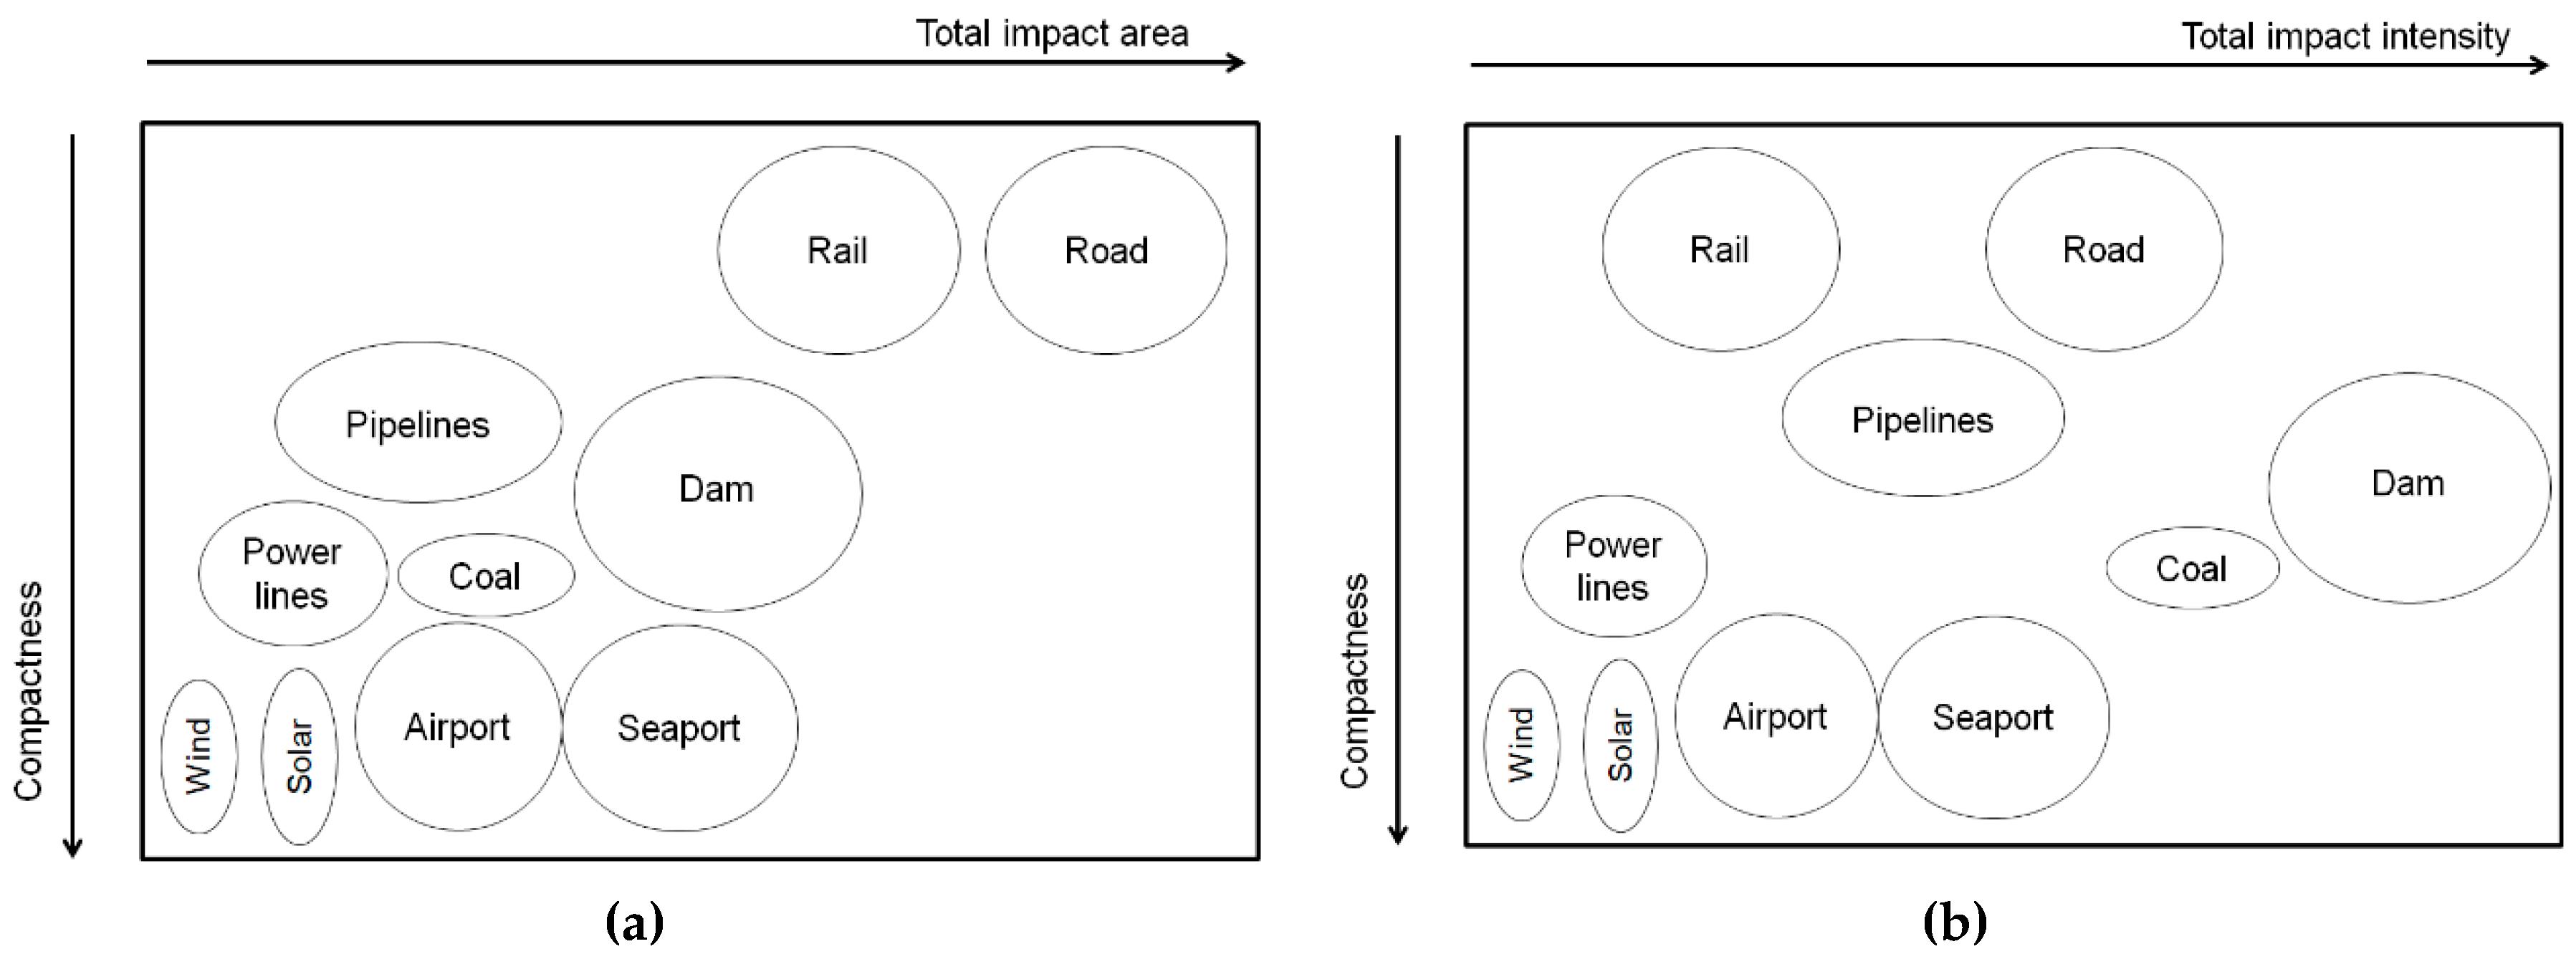 Environments | Free Full-Text | Environmental Impacts of